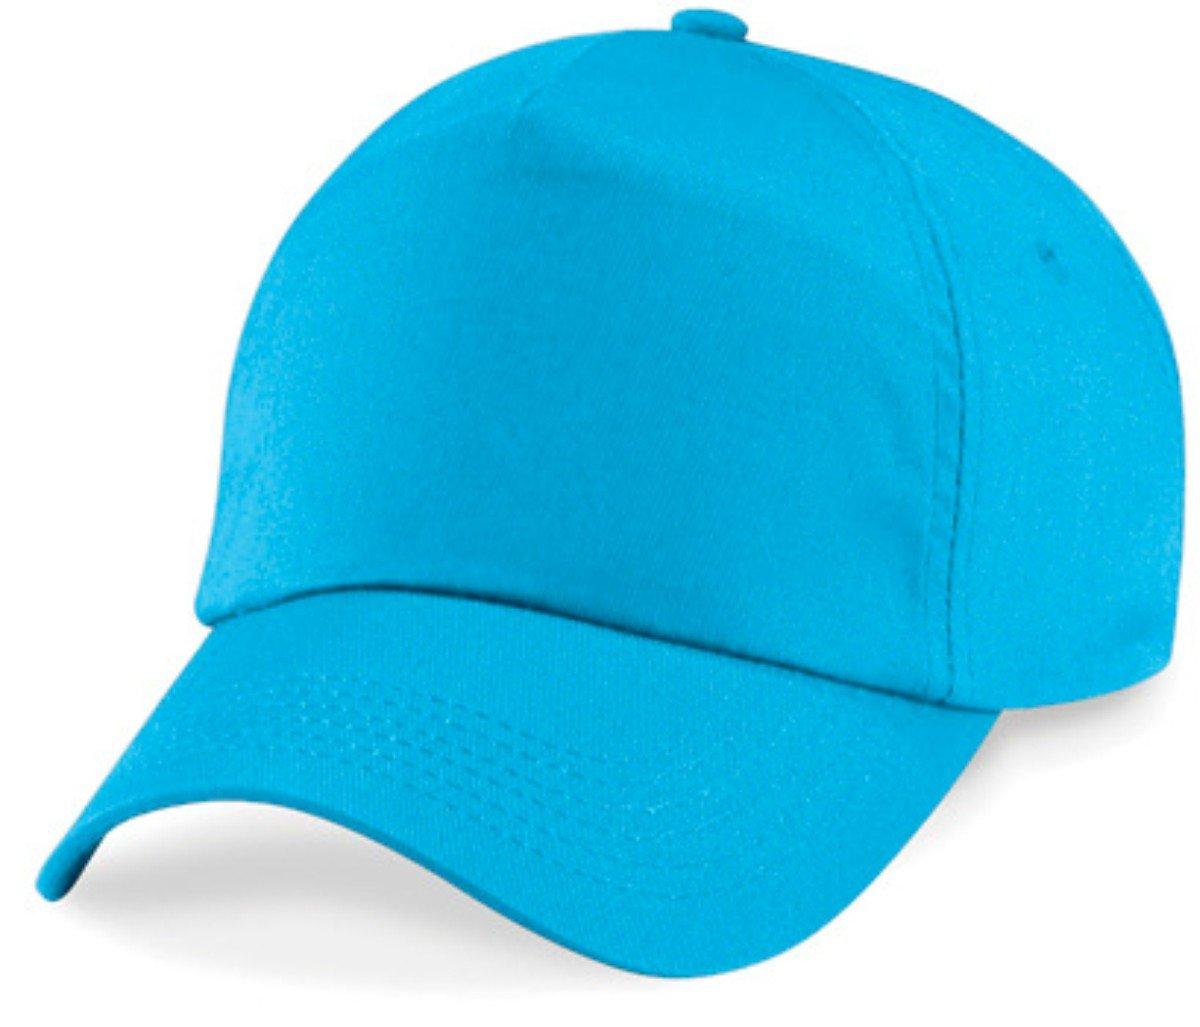 Shirtinstyle Basecap Cap 5 - Gorra unisex con cierre de velcro rojo rojo CAP10X001Rot